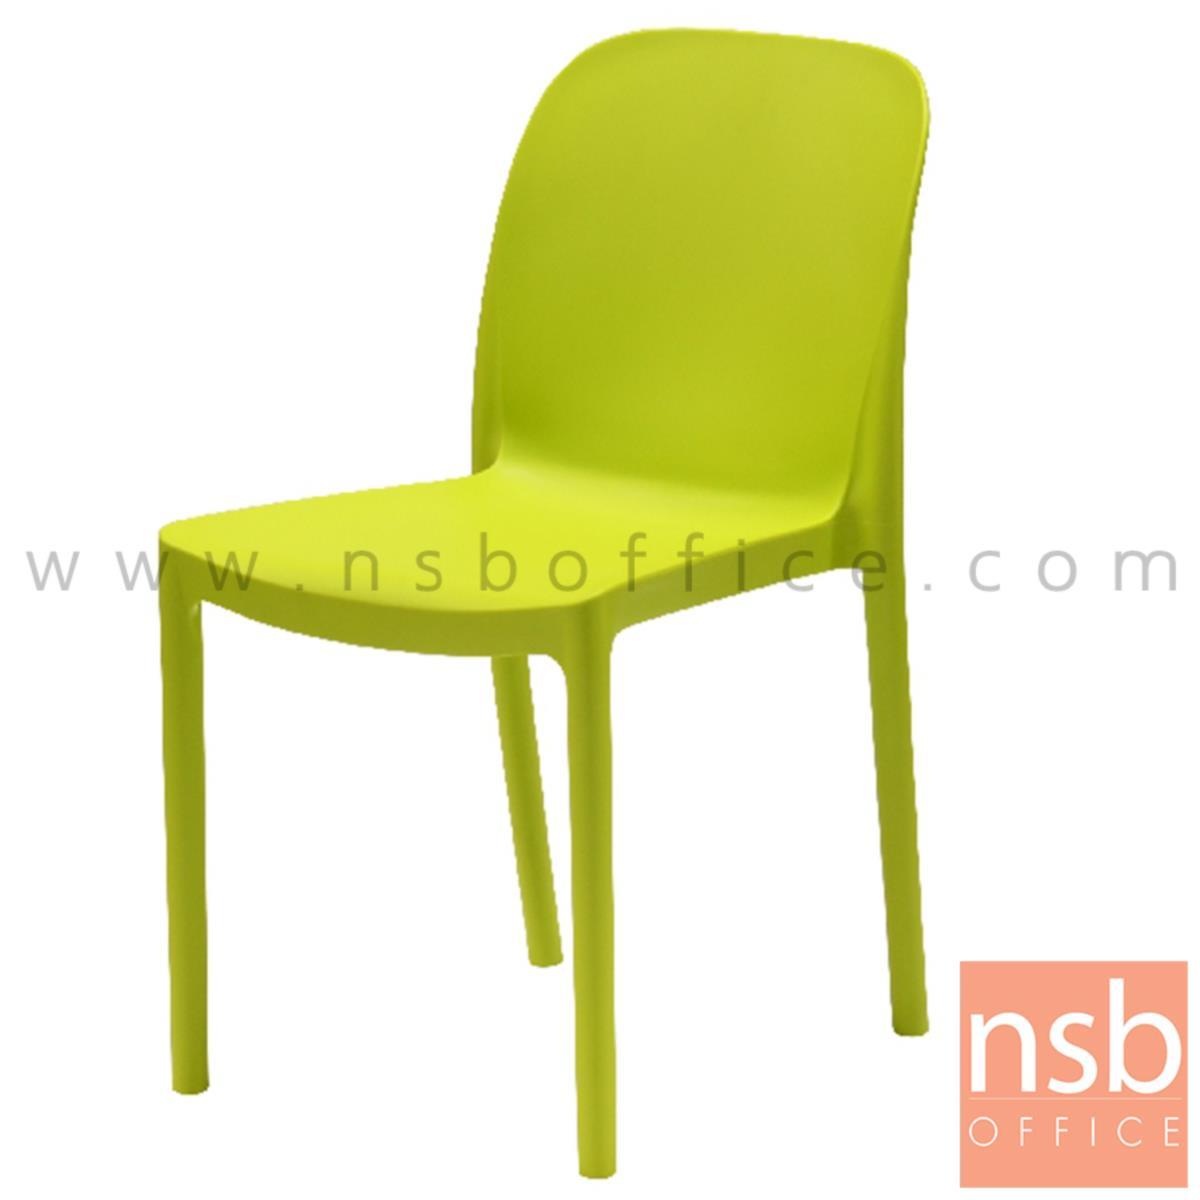 B29A199:เก้าอี้โมเดิร์นพลาสติก(PP)ล้วน รุ่น PO-PN73 ขนาด 41W cm.